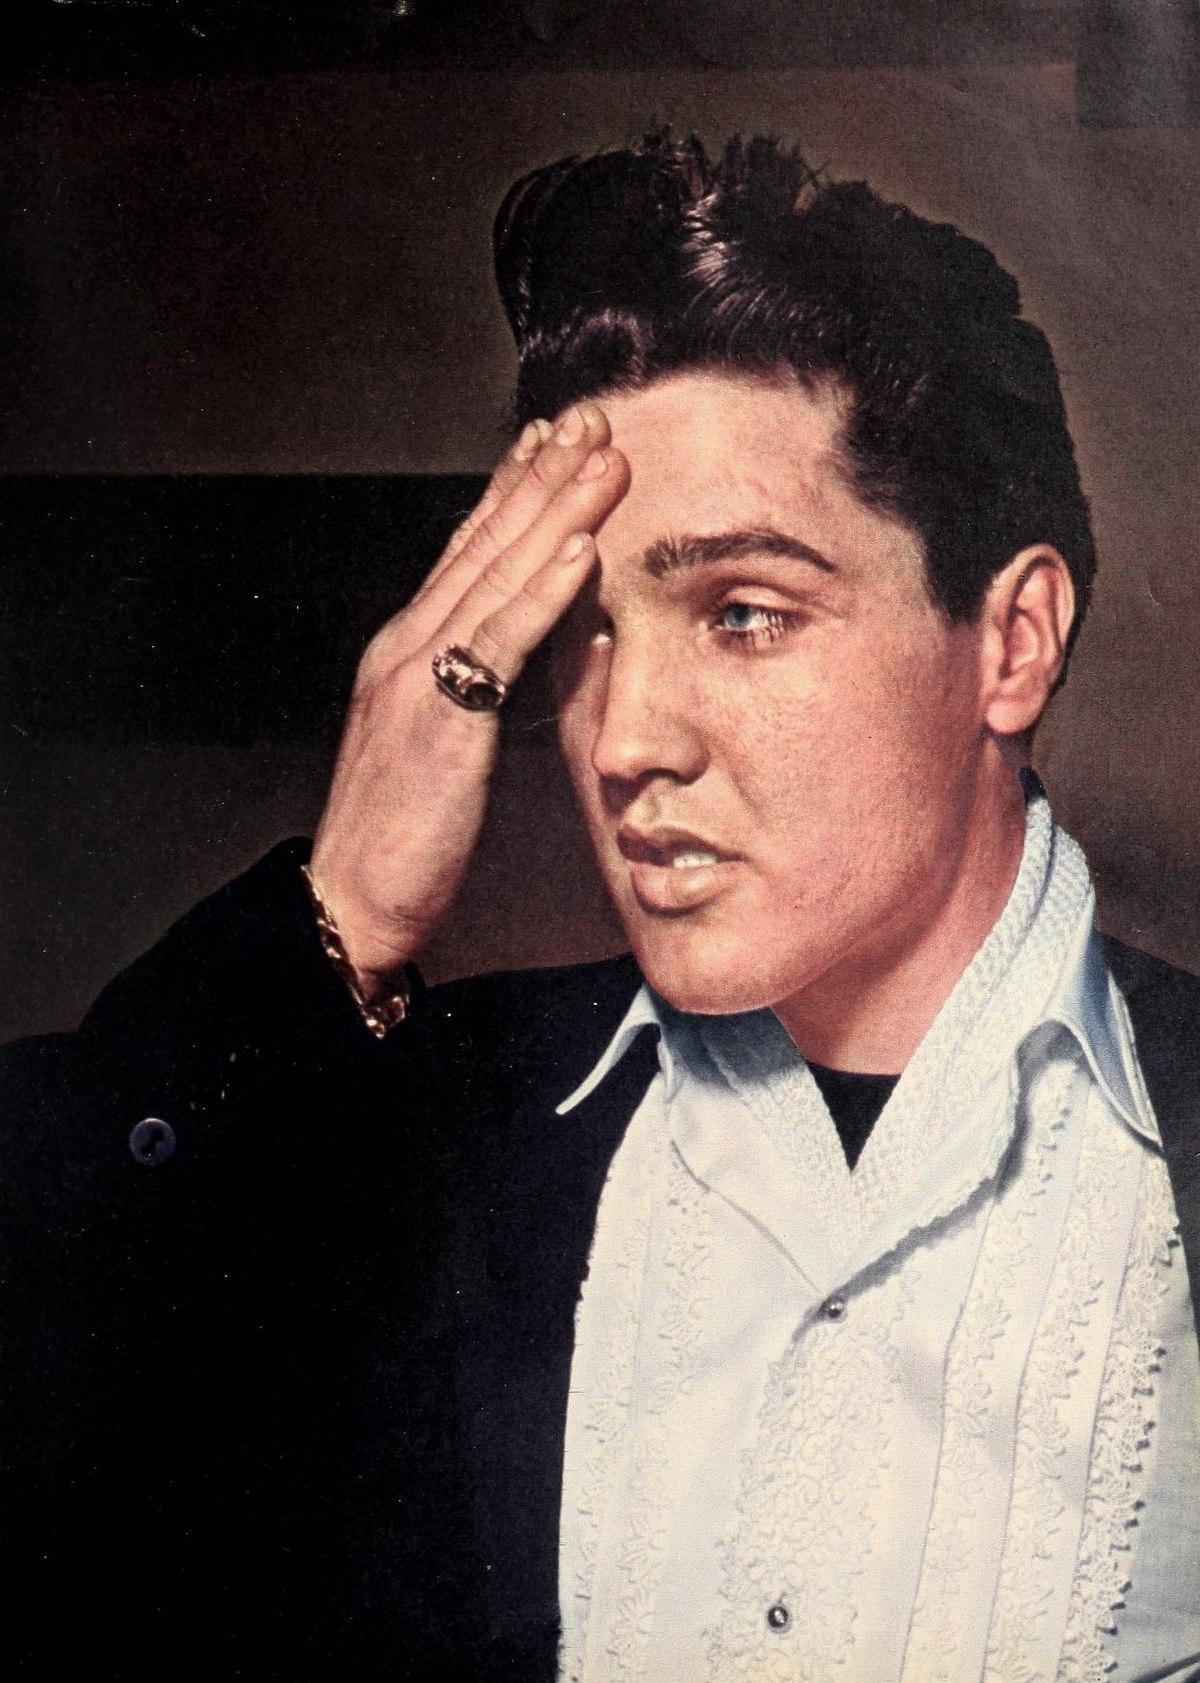 Cultural Impact Of Elvis Presley Wikipedia